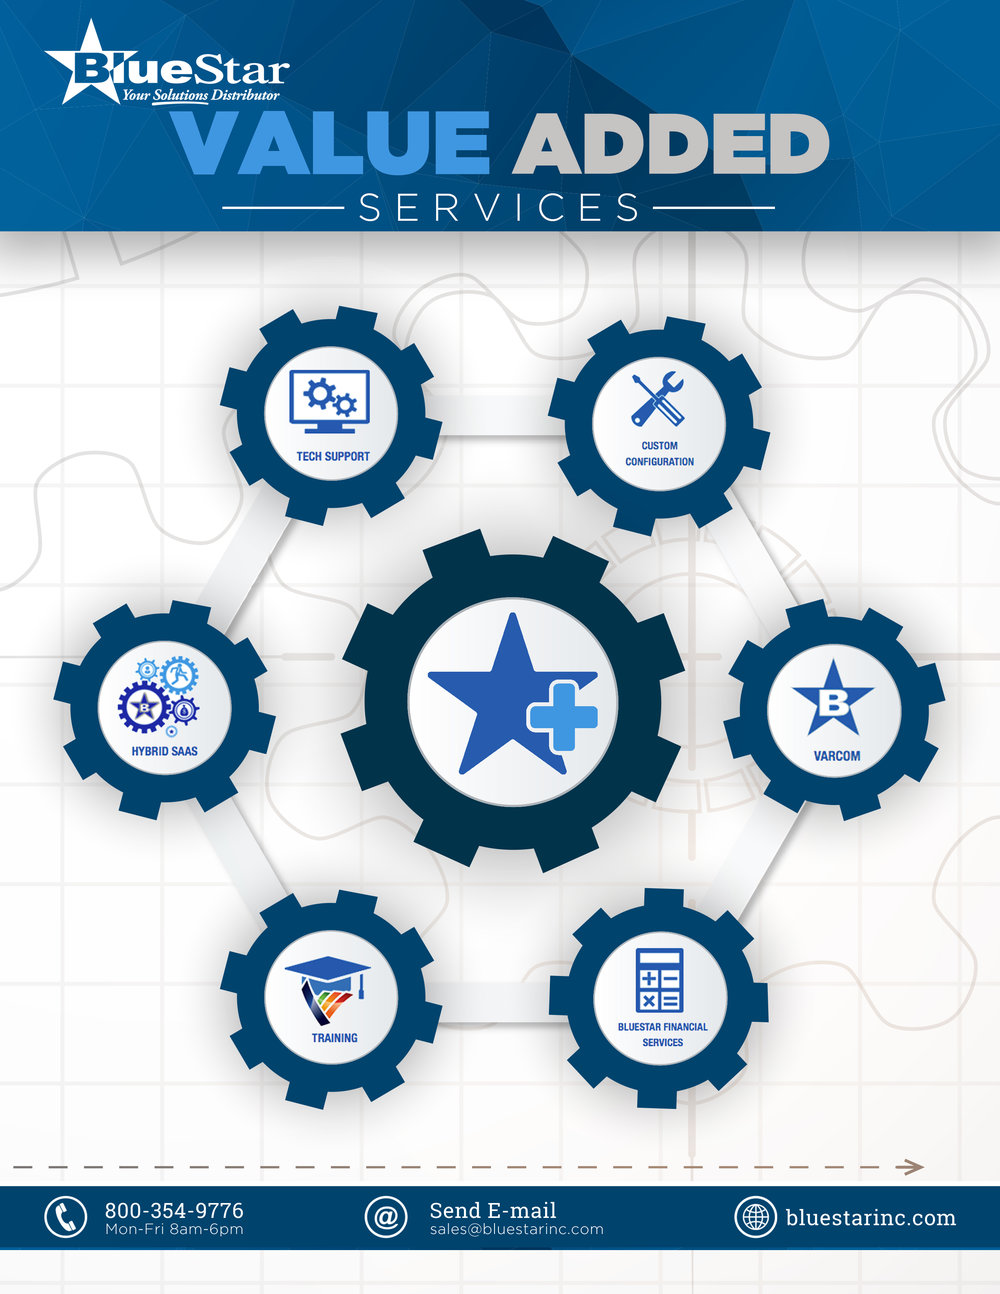 BlueStar Value Addes Services Ad 2016